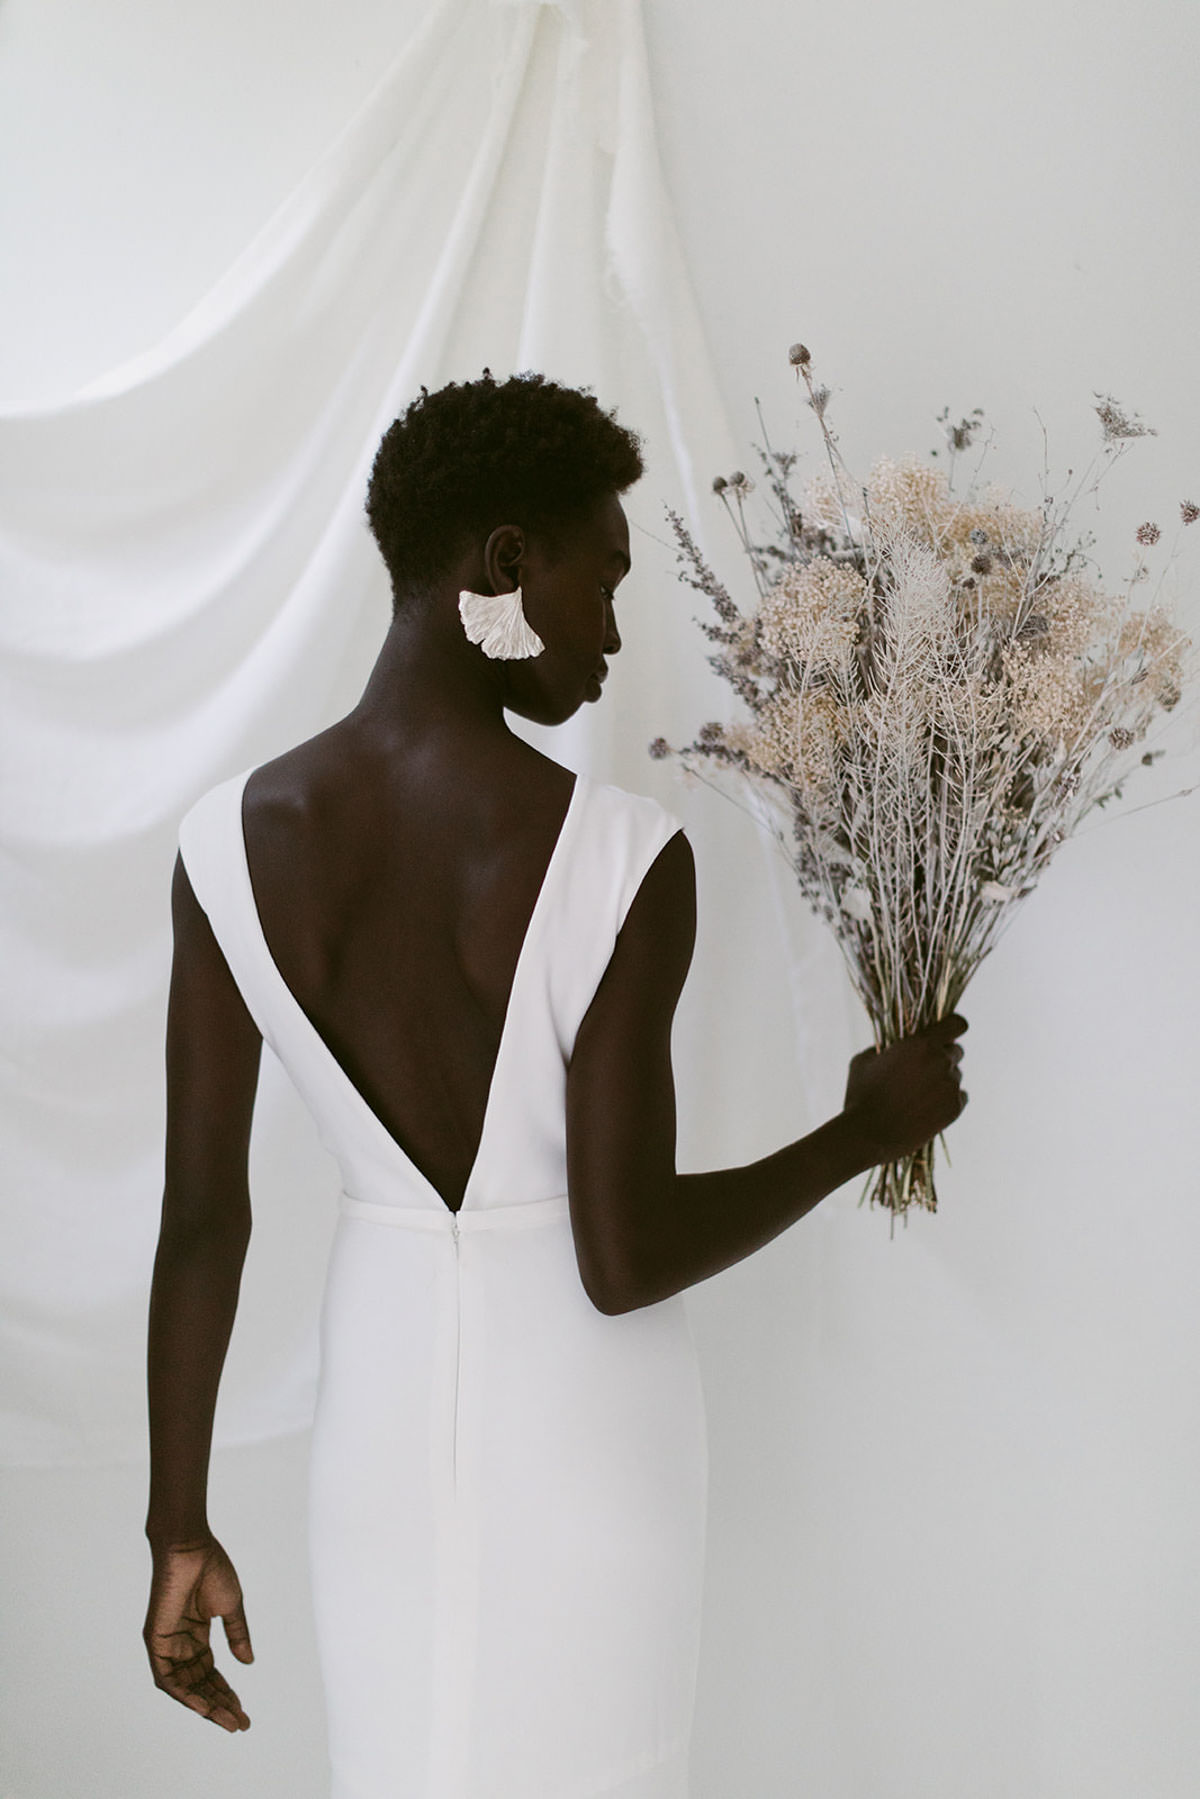 beautiful bride, black bride, beauty editorial, , classic bride, delicate bridalwear, edgy bridalstyle, feminine bride, hand painted florals, kaley from Kanvas, mininal bridalstyle, mordern bride, nature wedding, organic beauty, tonal backdrop